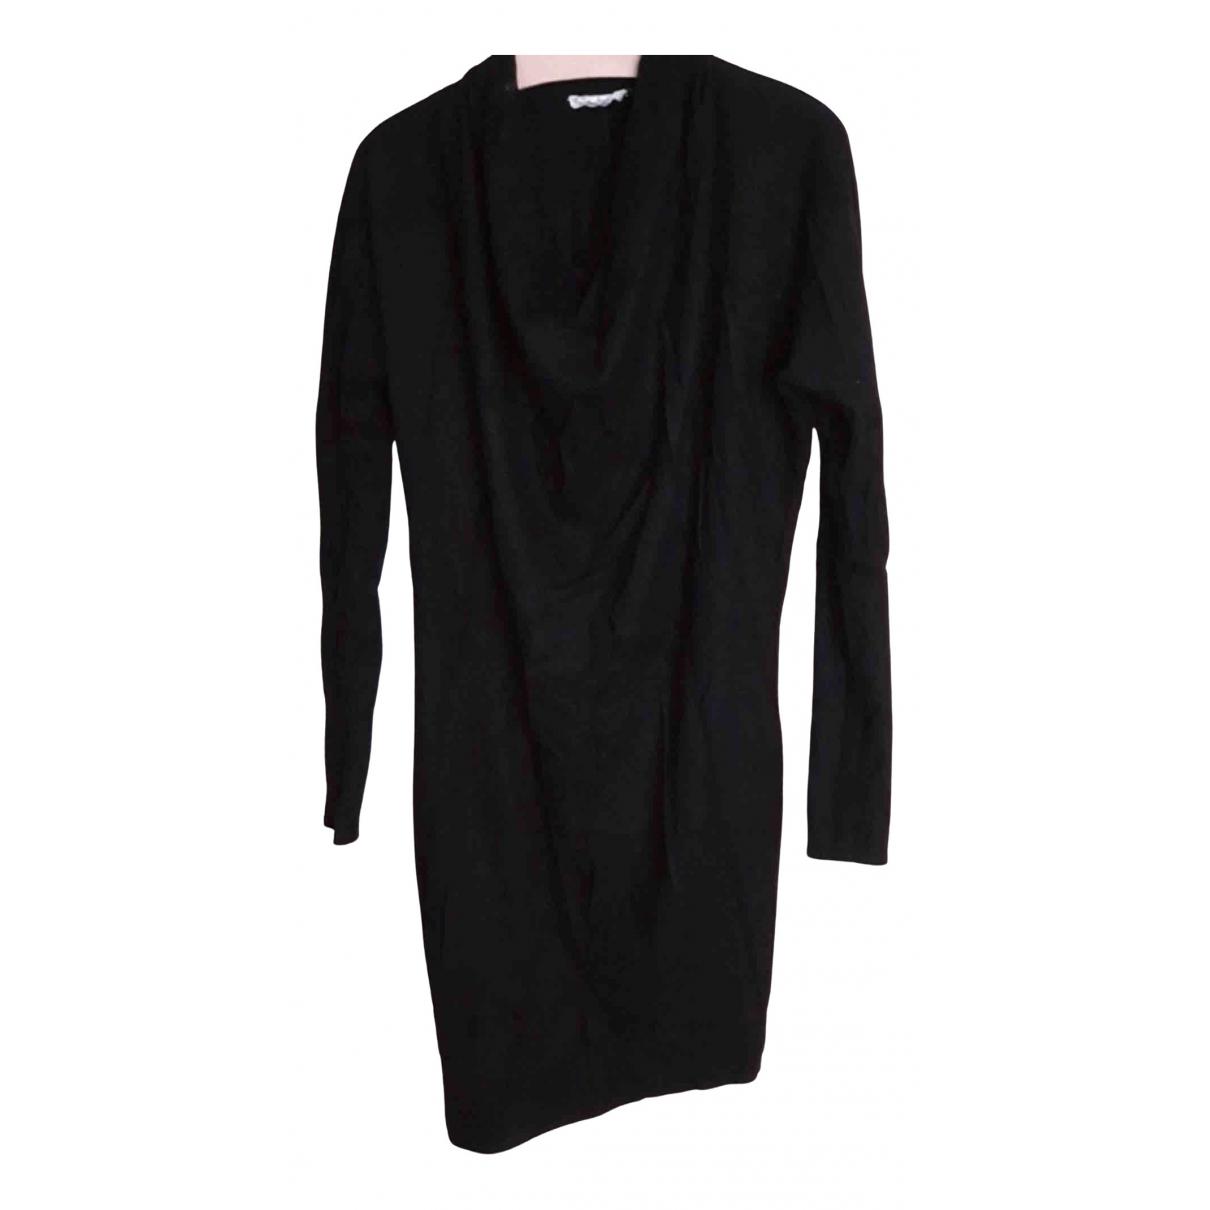 Helmut Lang \N Black Wool dress for Women S International